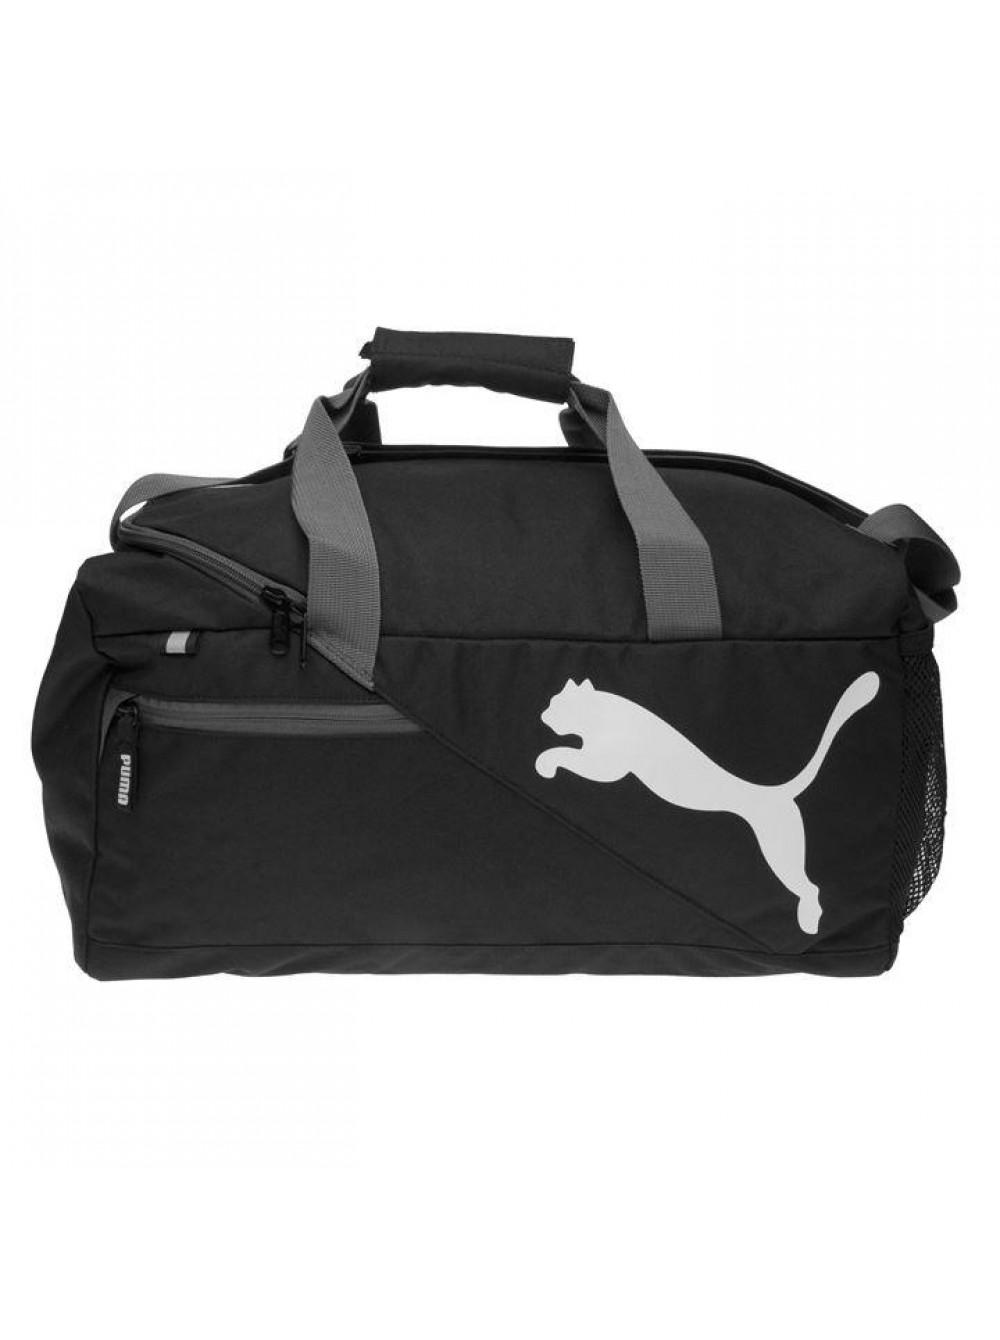 bedd5a753b25 Puma Fundamentals - Купить сумку спортивную Киев - Сумка молодежная